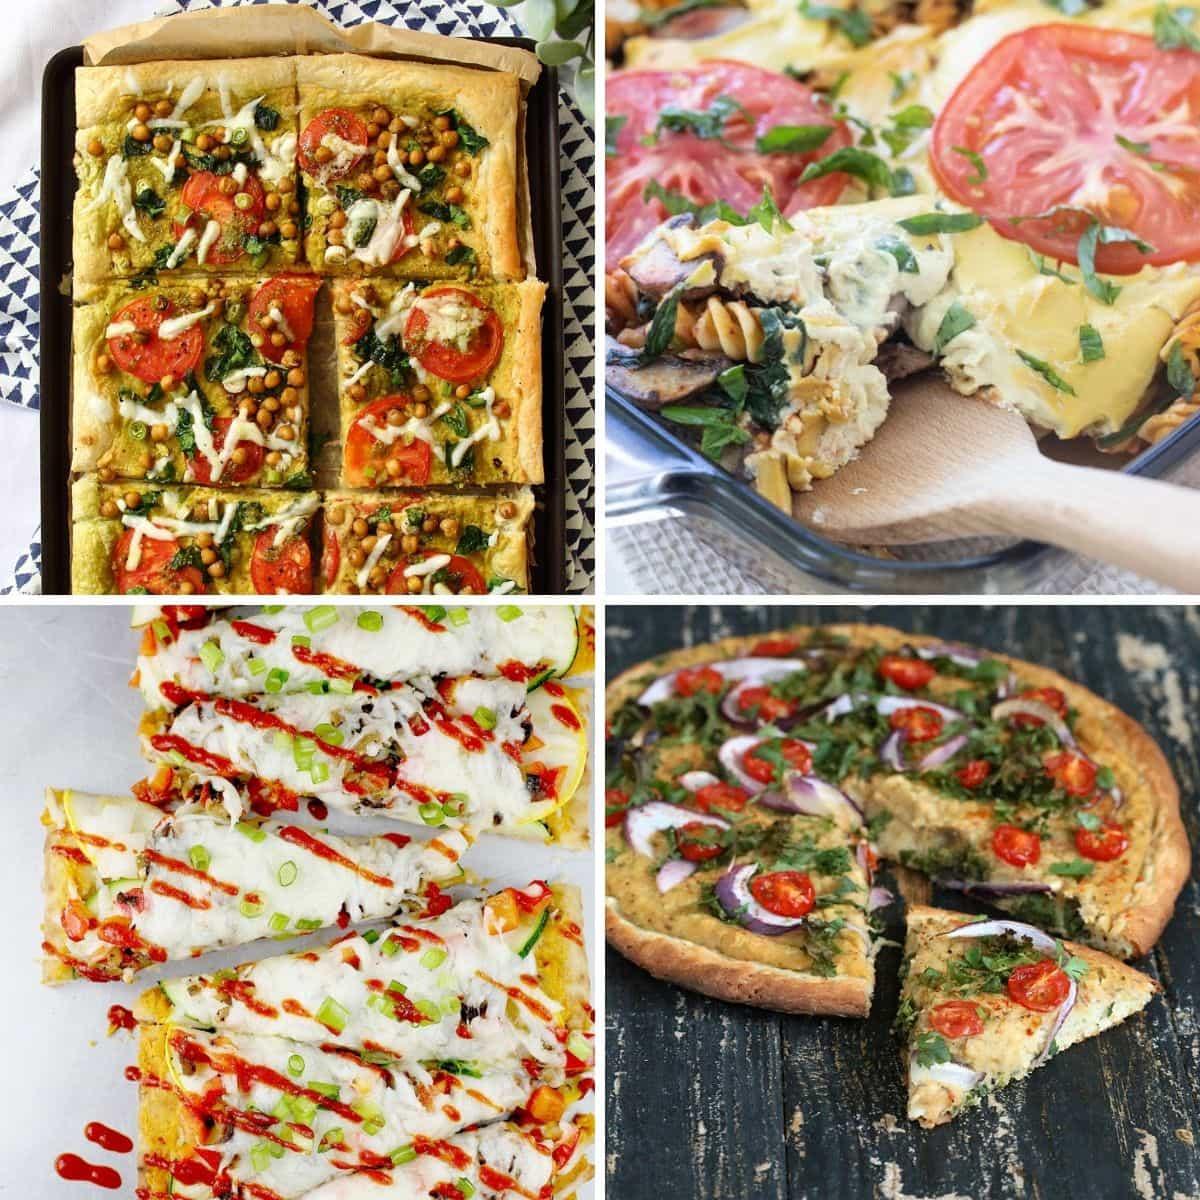 4 images 4 food: Spinach & Tomato Hummus Tart, High Protein Vegan Pasta Bake, Spicy Vegetable Thai Flatbread, Roasted Hatch Chile White Bean Hummus on Quinoa Pizza Crust